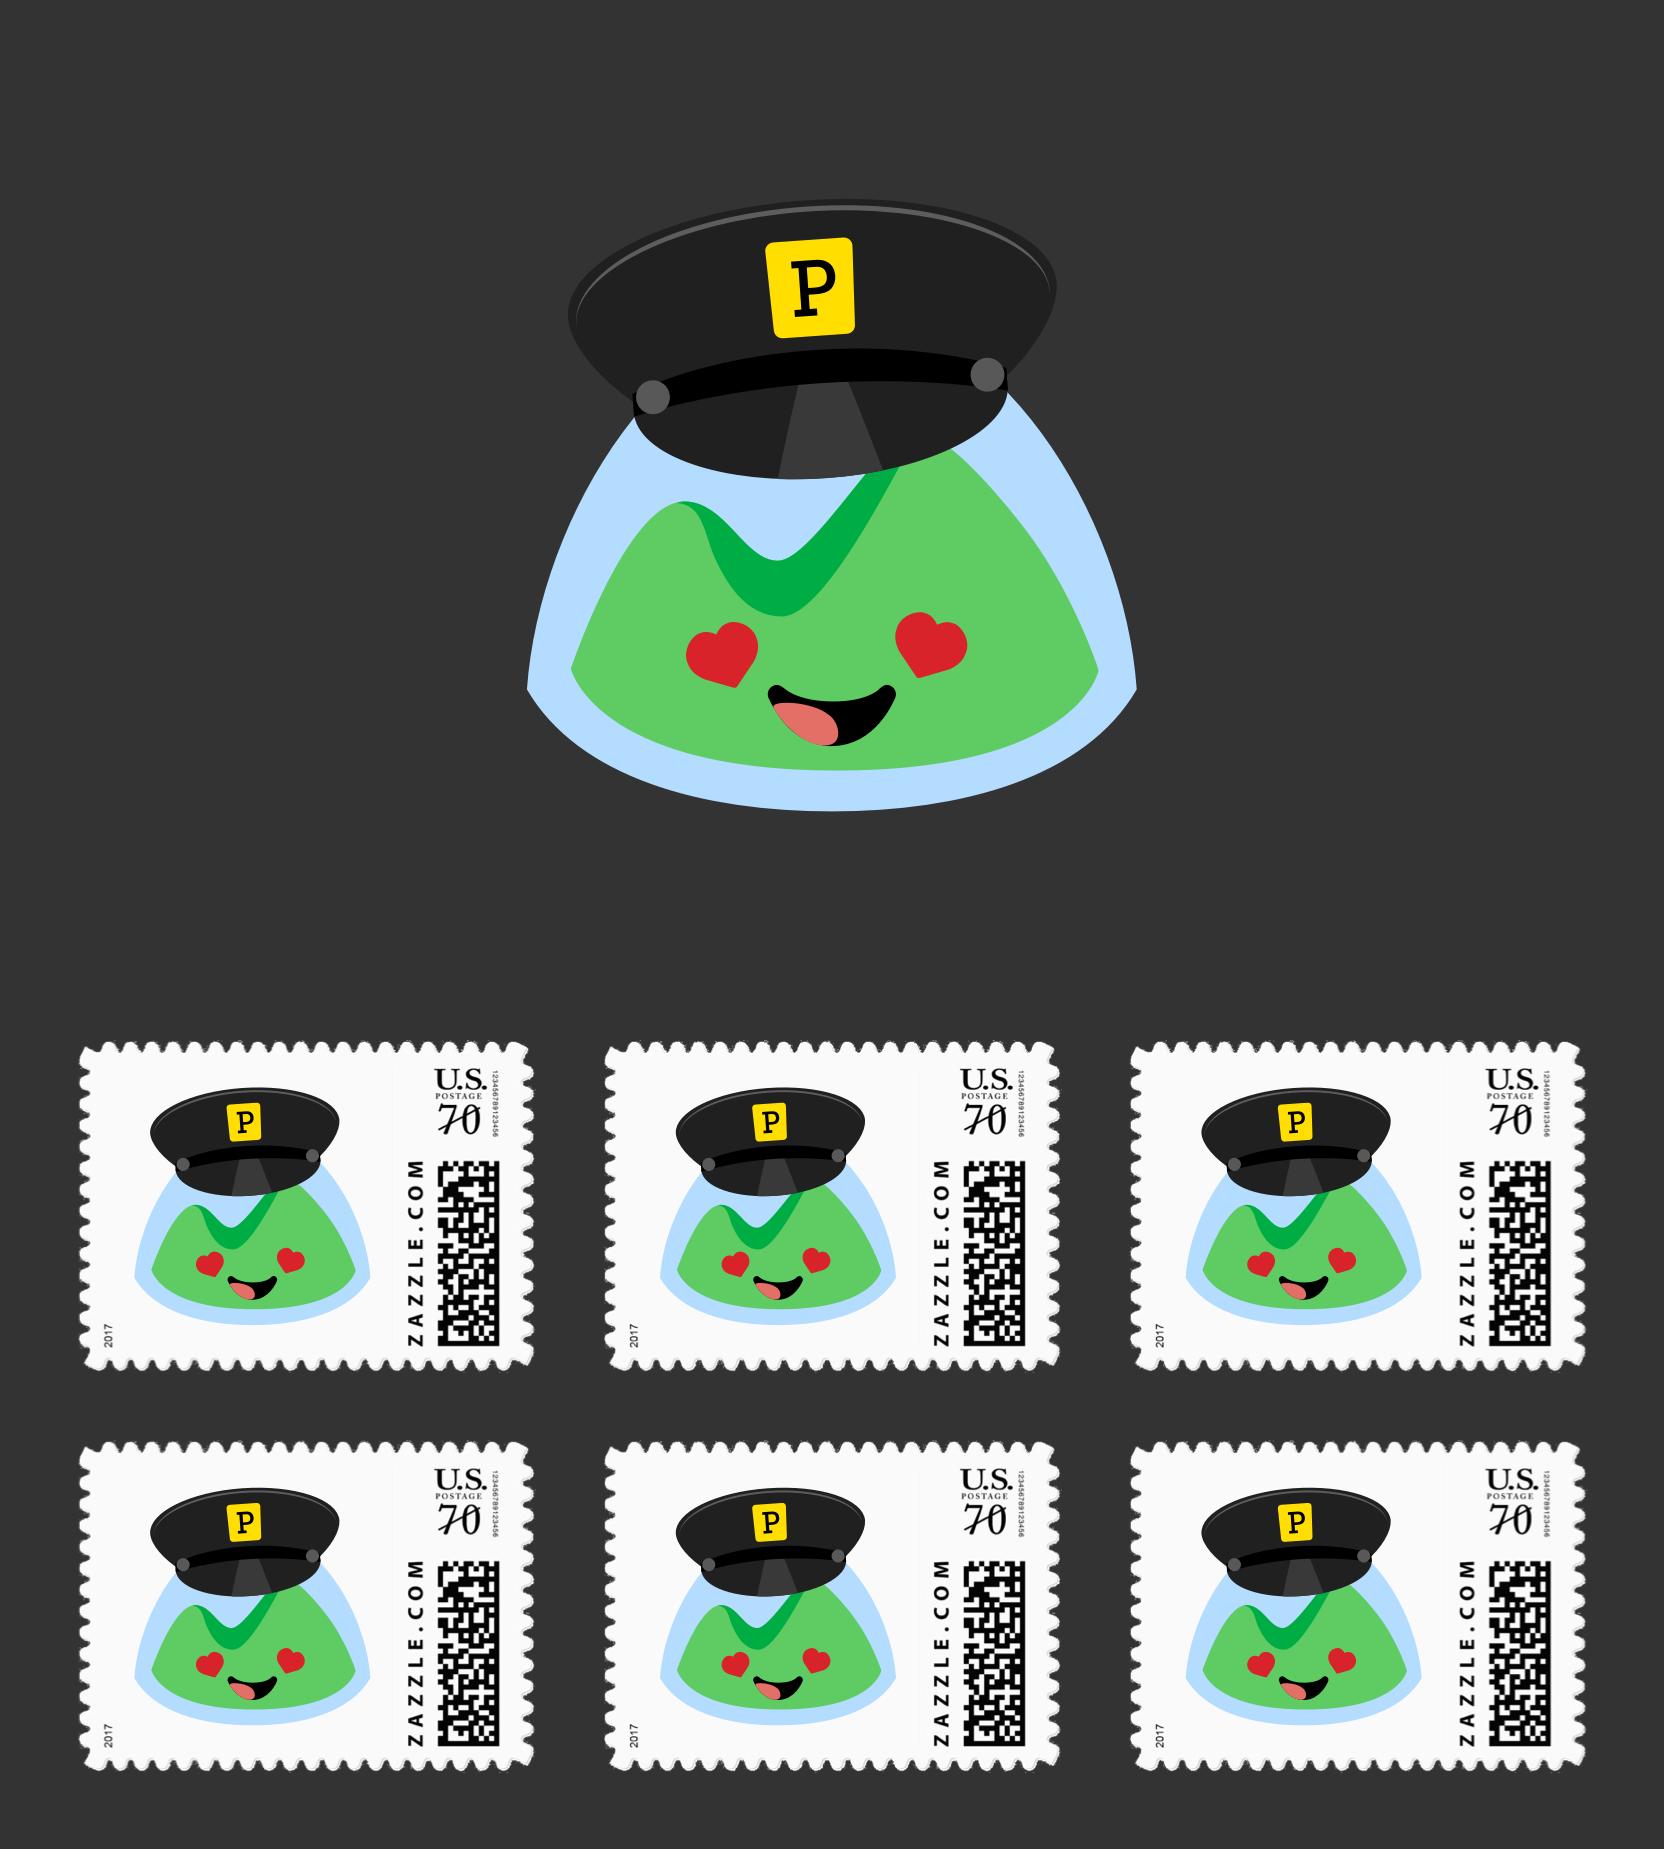 Branded-Postage-Stamps